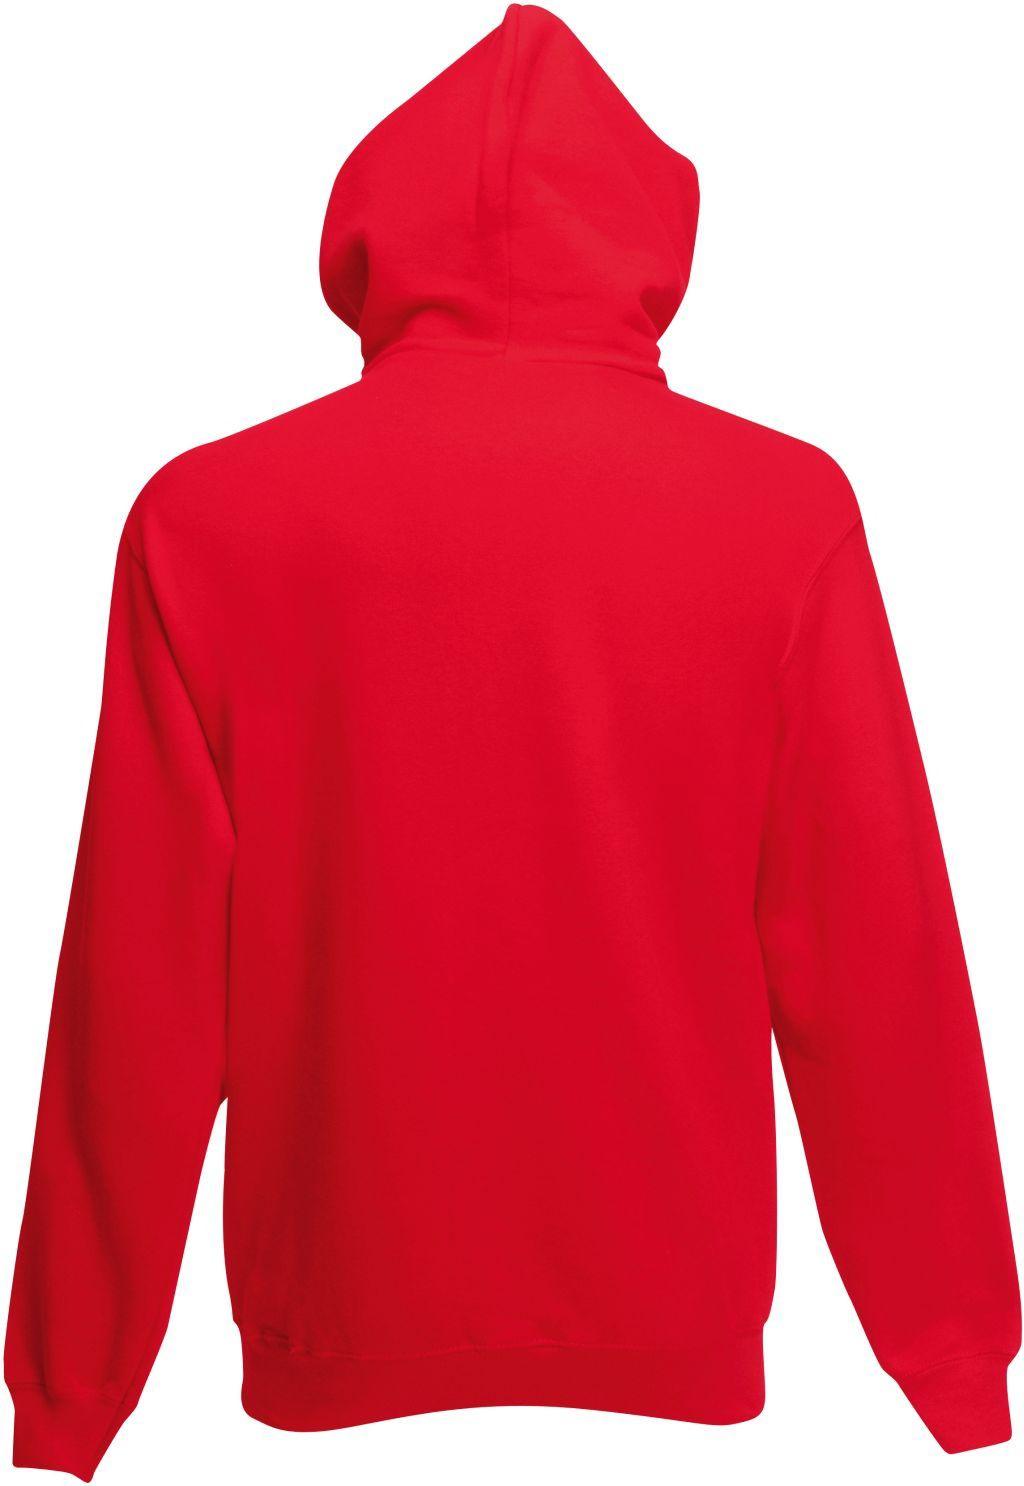 0d802f2ba63e Bluza męska rozpinana z kapturem Premium Czerwona L    Fruit Of The Loom